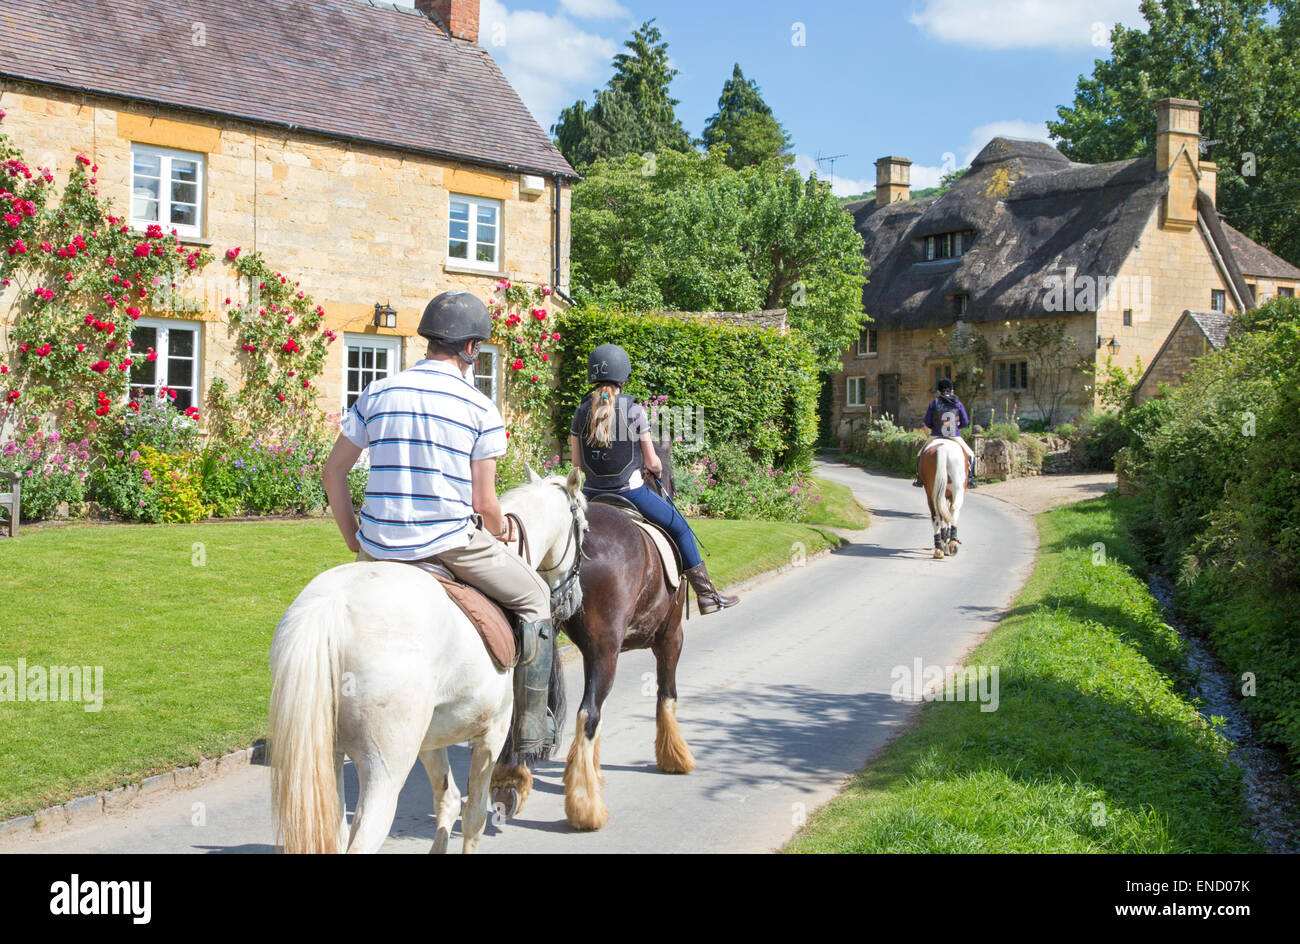 Reiten in Cotswold Dorf Stanton, Gloucestershire, England, Großbritannien Stockbild